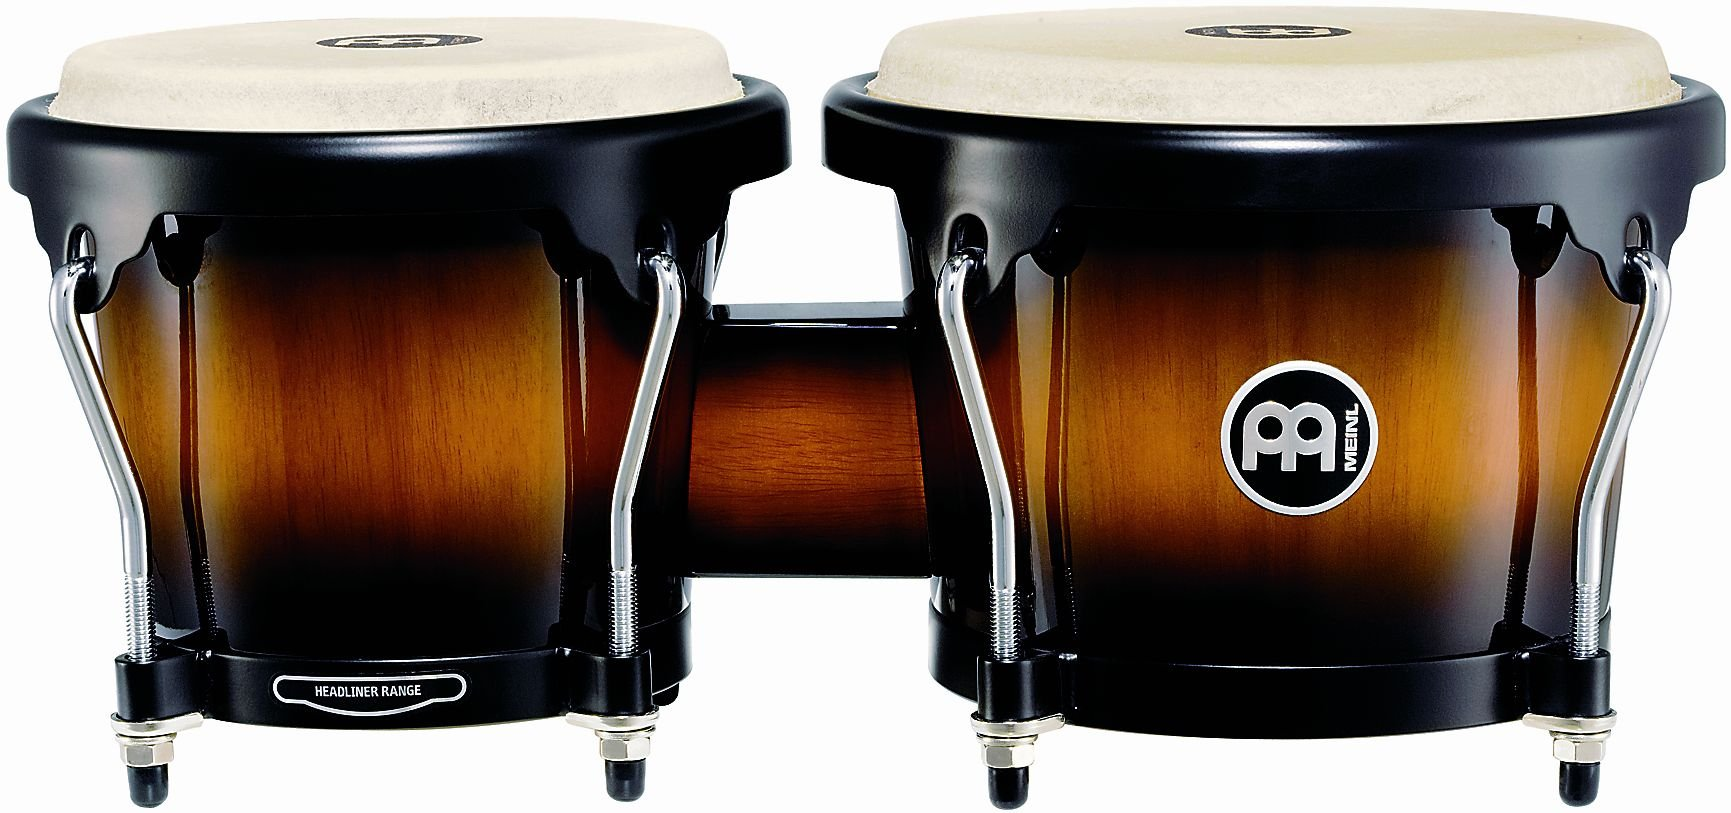 Meinl Percussion Bongos With Hardwood Shells - NOT MADE IN CHINA - Vintage Sun burst Finish, Buffalo Skin Heads, 2-YEAR WARRANTY HB100VSB